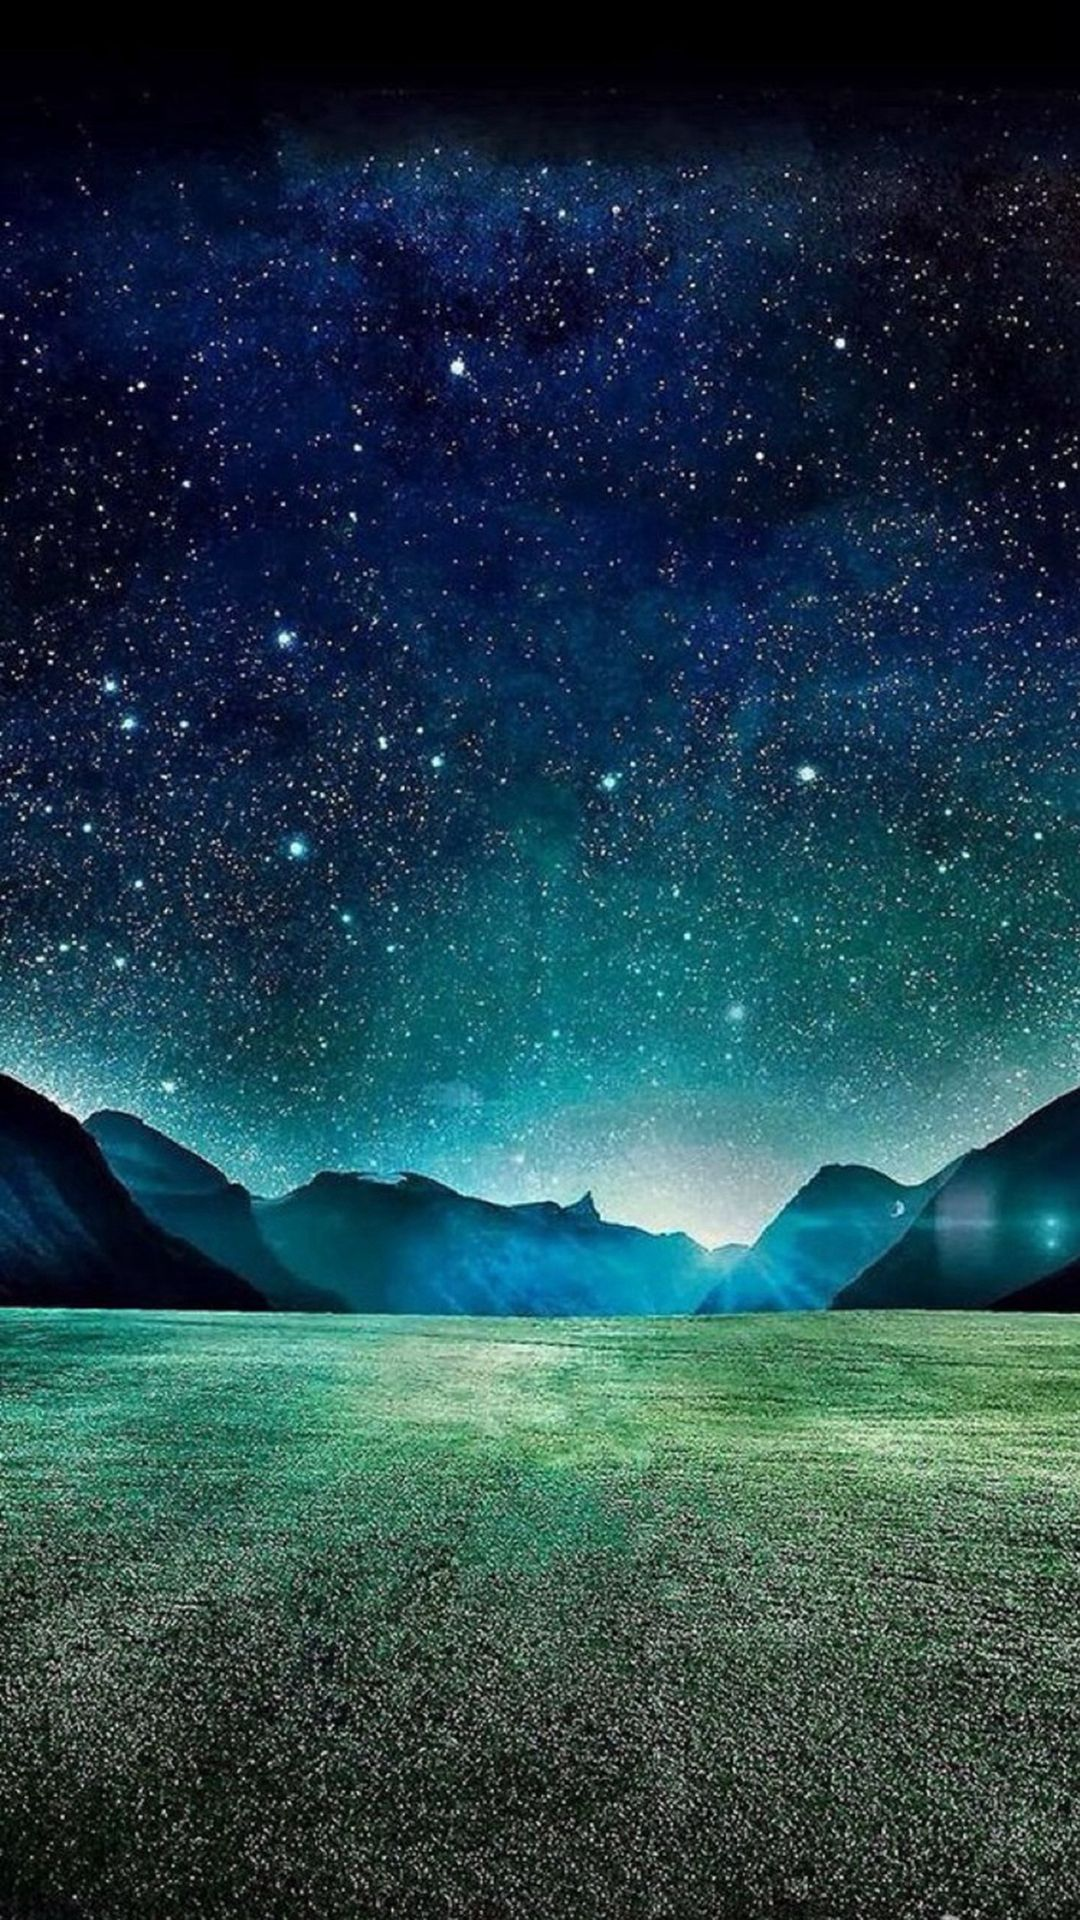 dark night starry shiny mountain grass field #iphone #7 #wallpaper